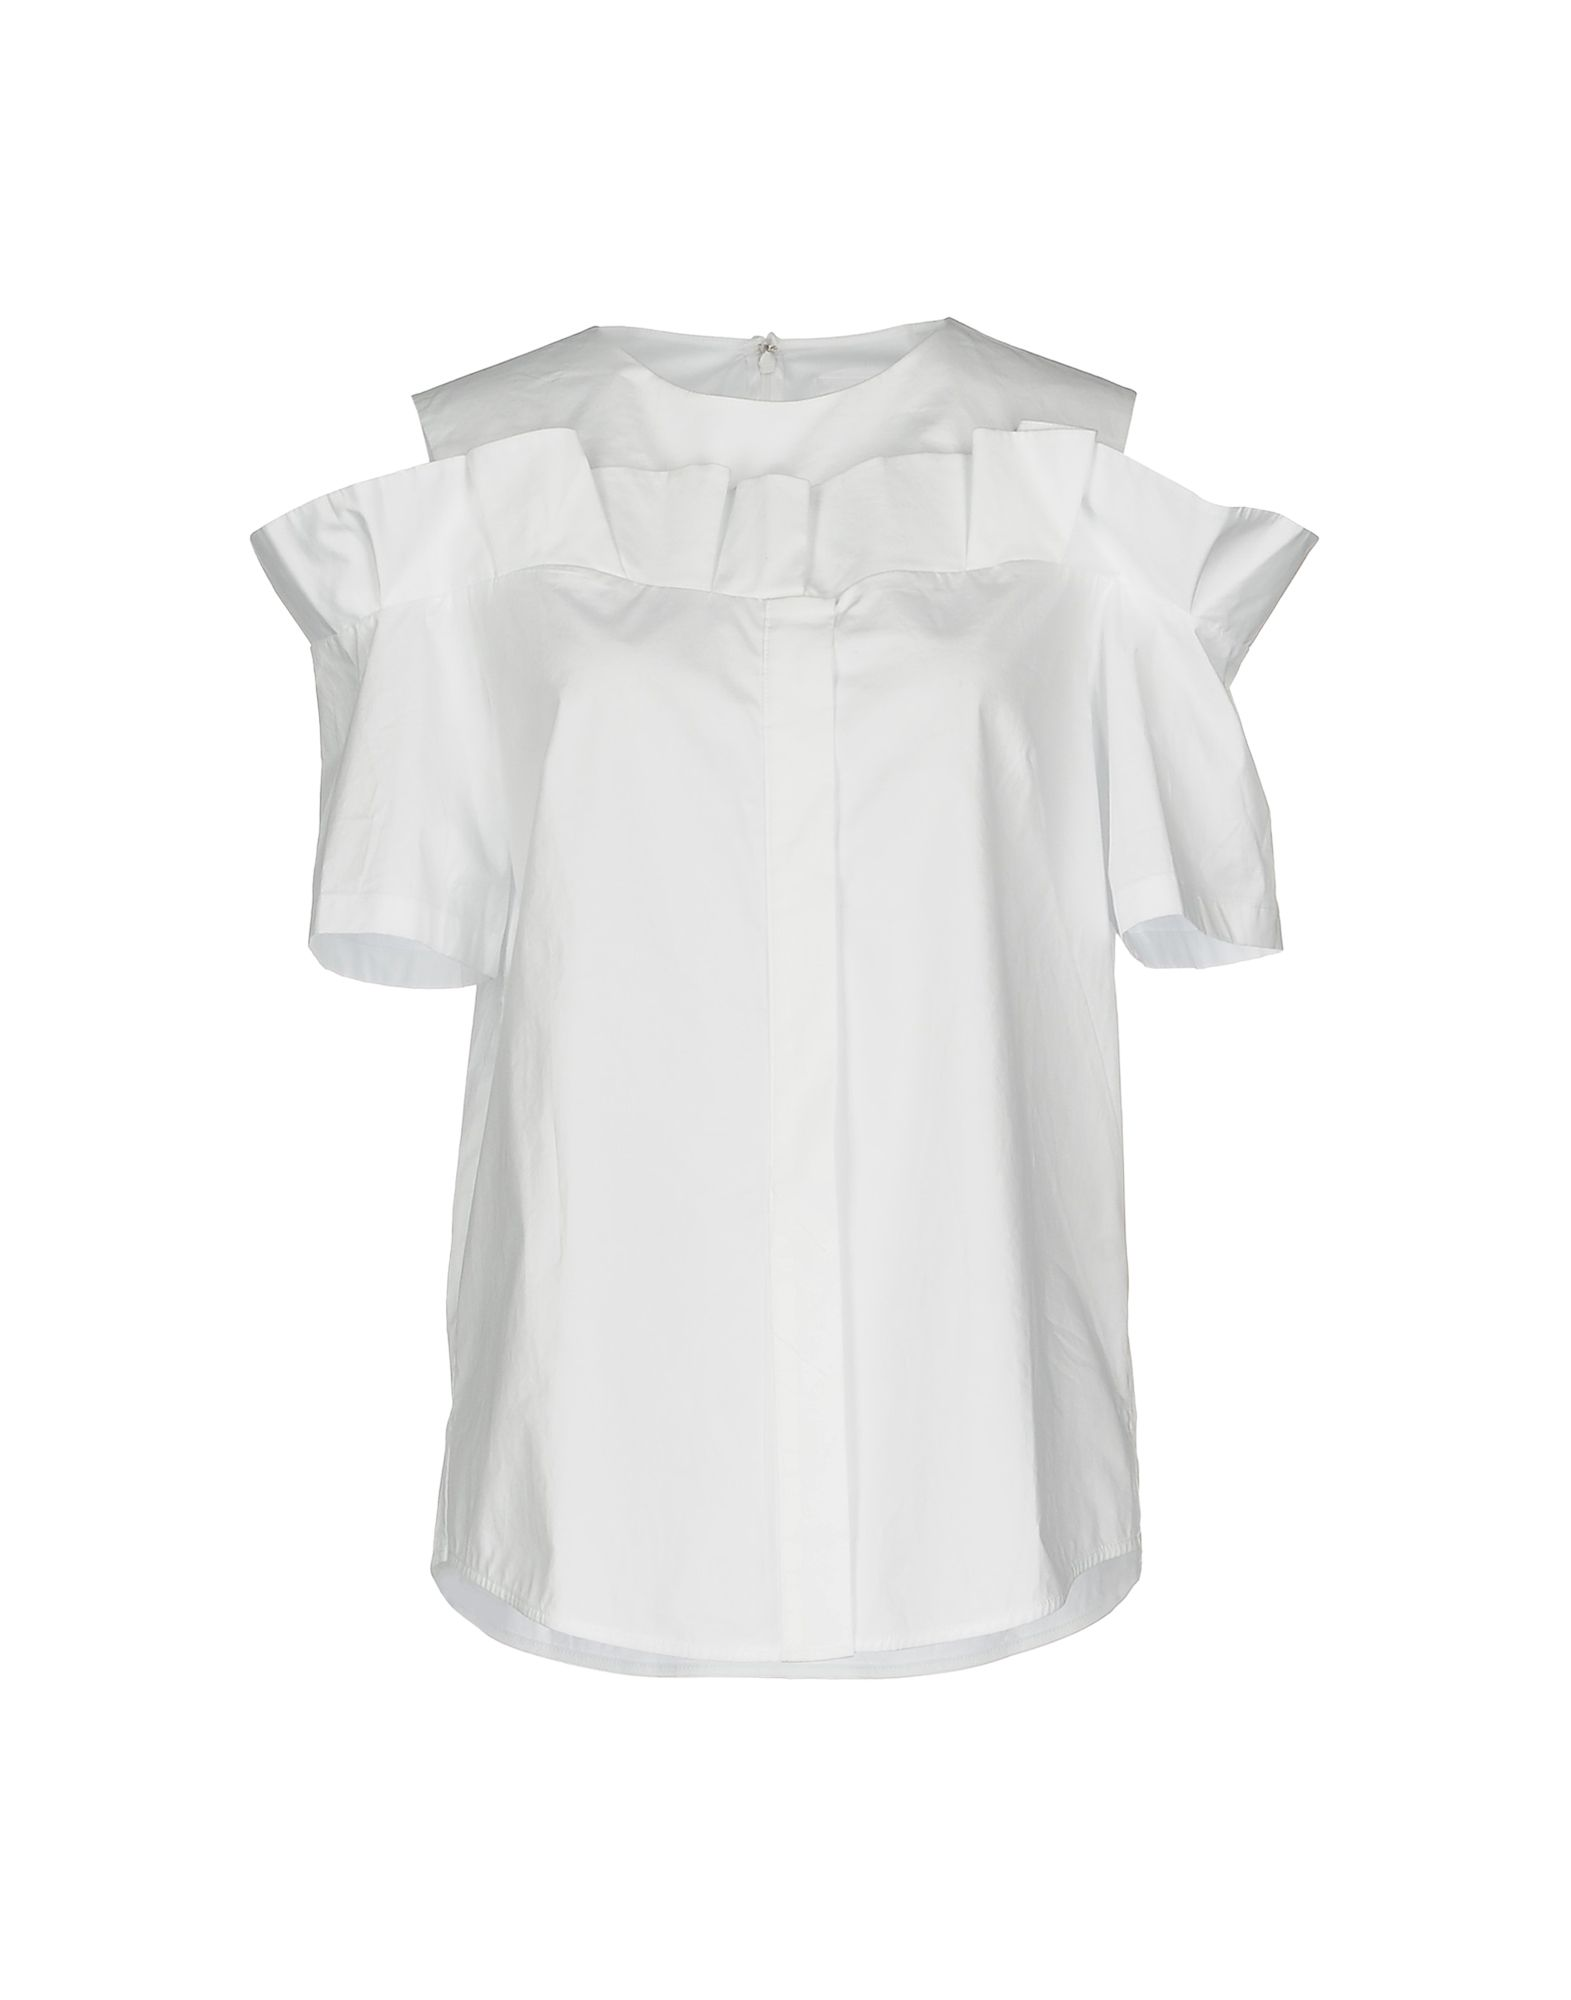 STEVE J & YONI P Pубашка j shirt pубашка